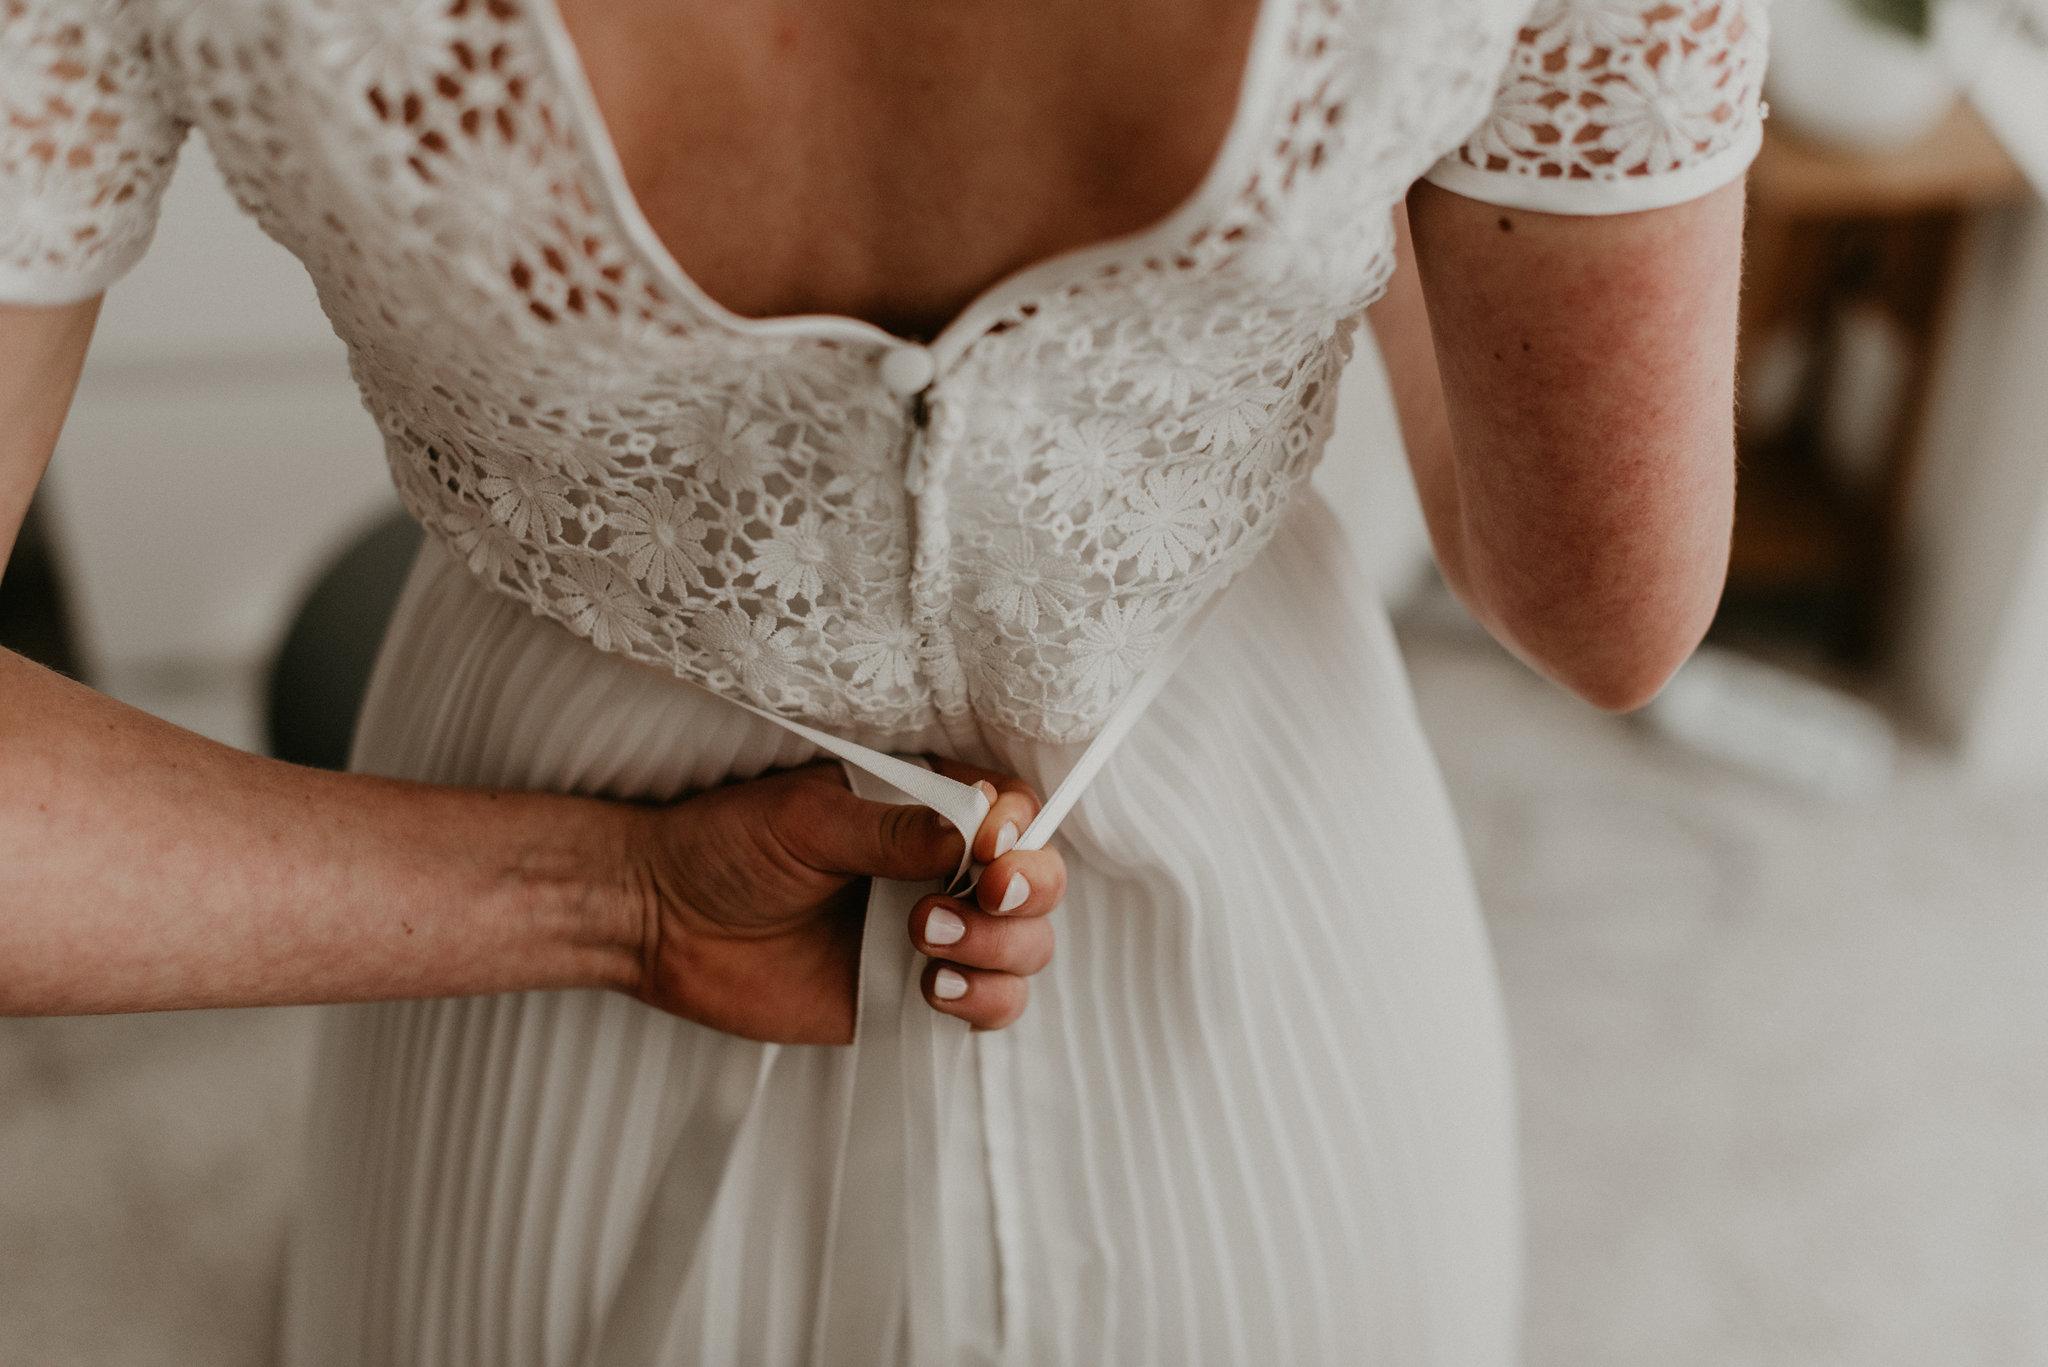 Rotterdam bride getting her final adjustments on her wedding dress